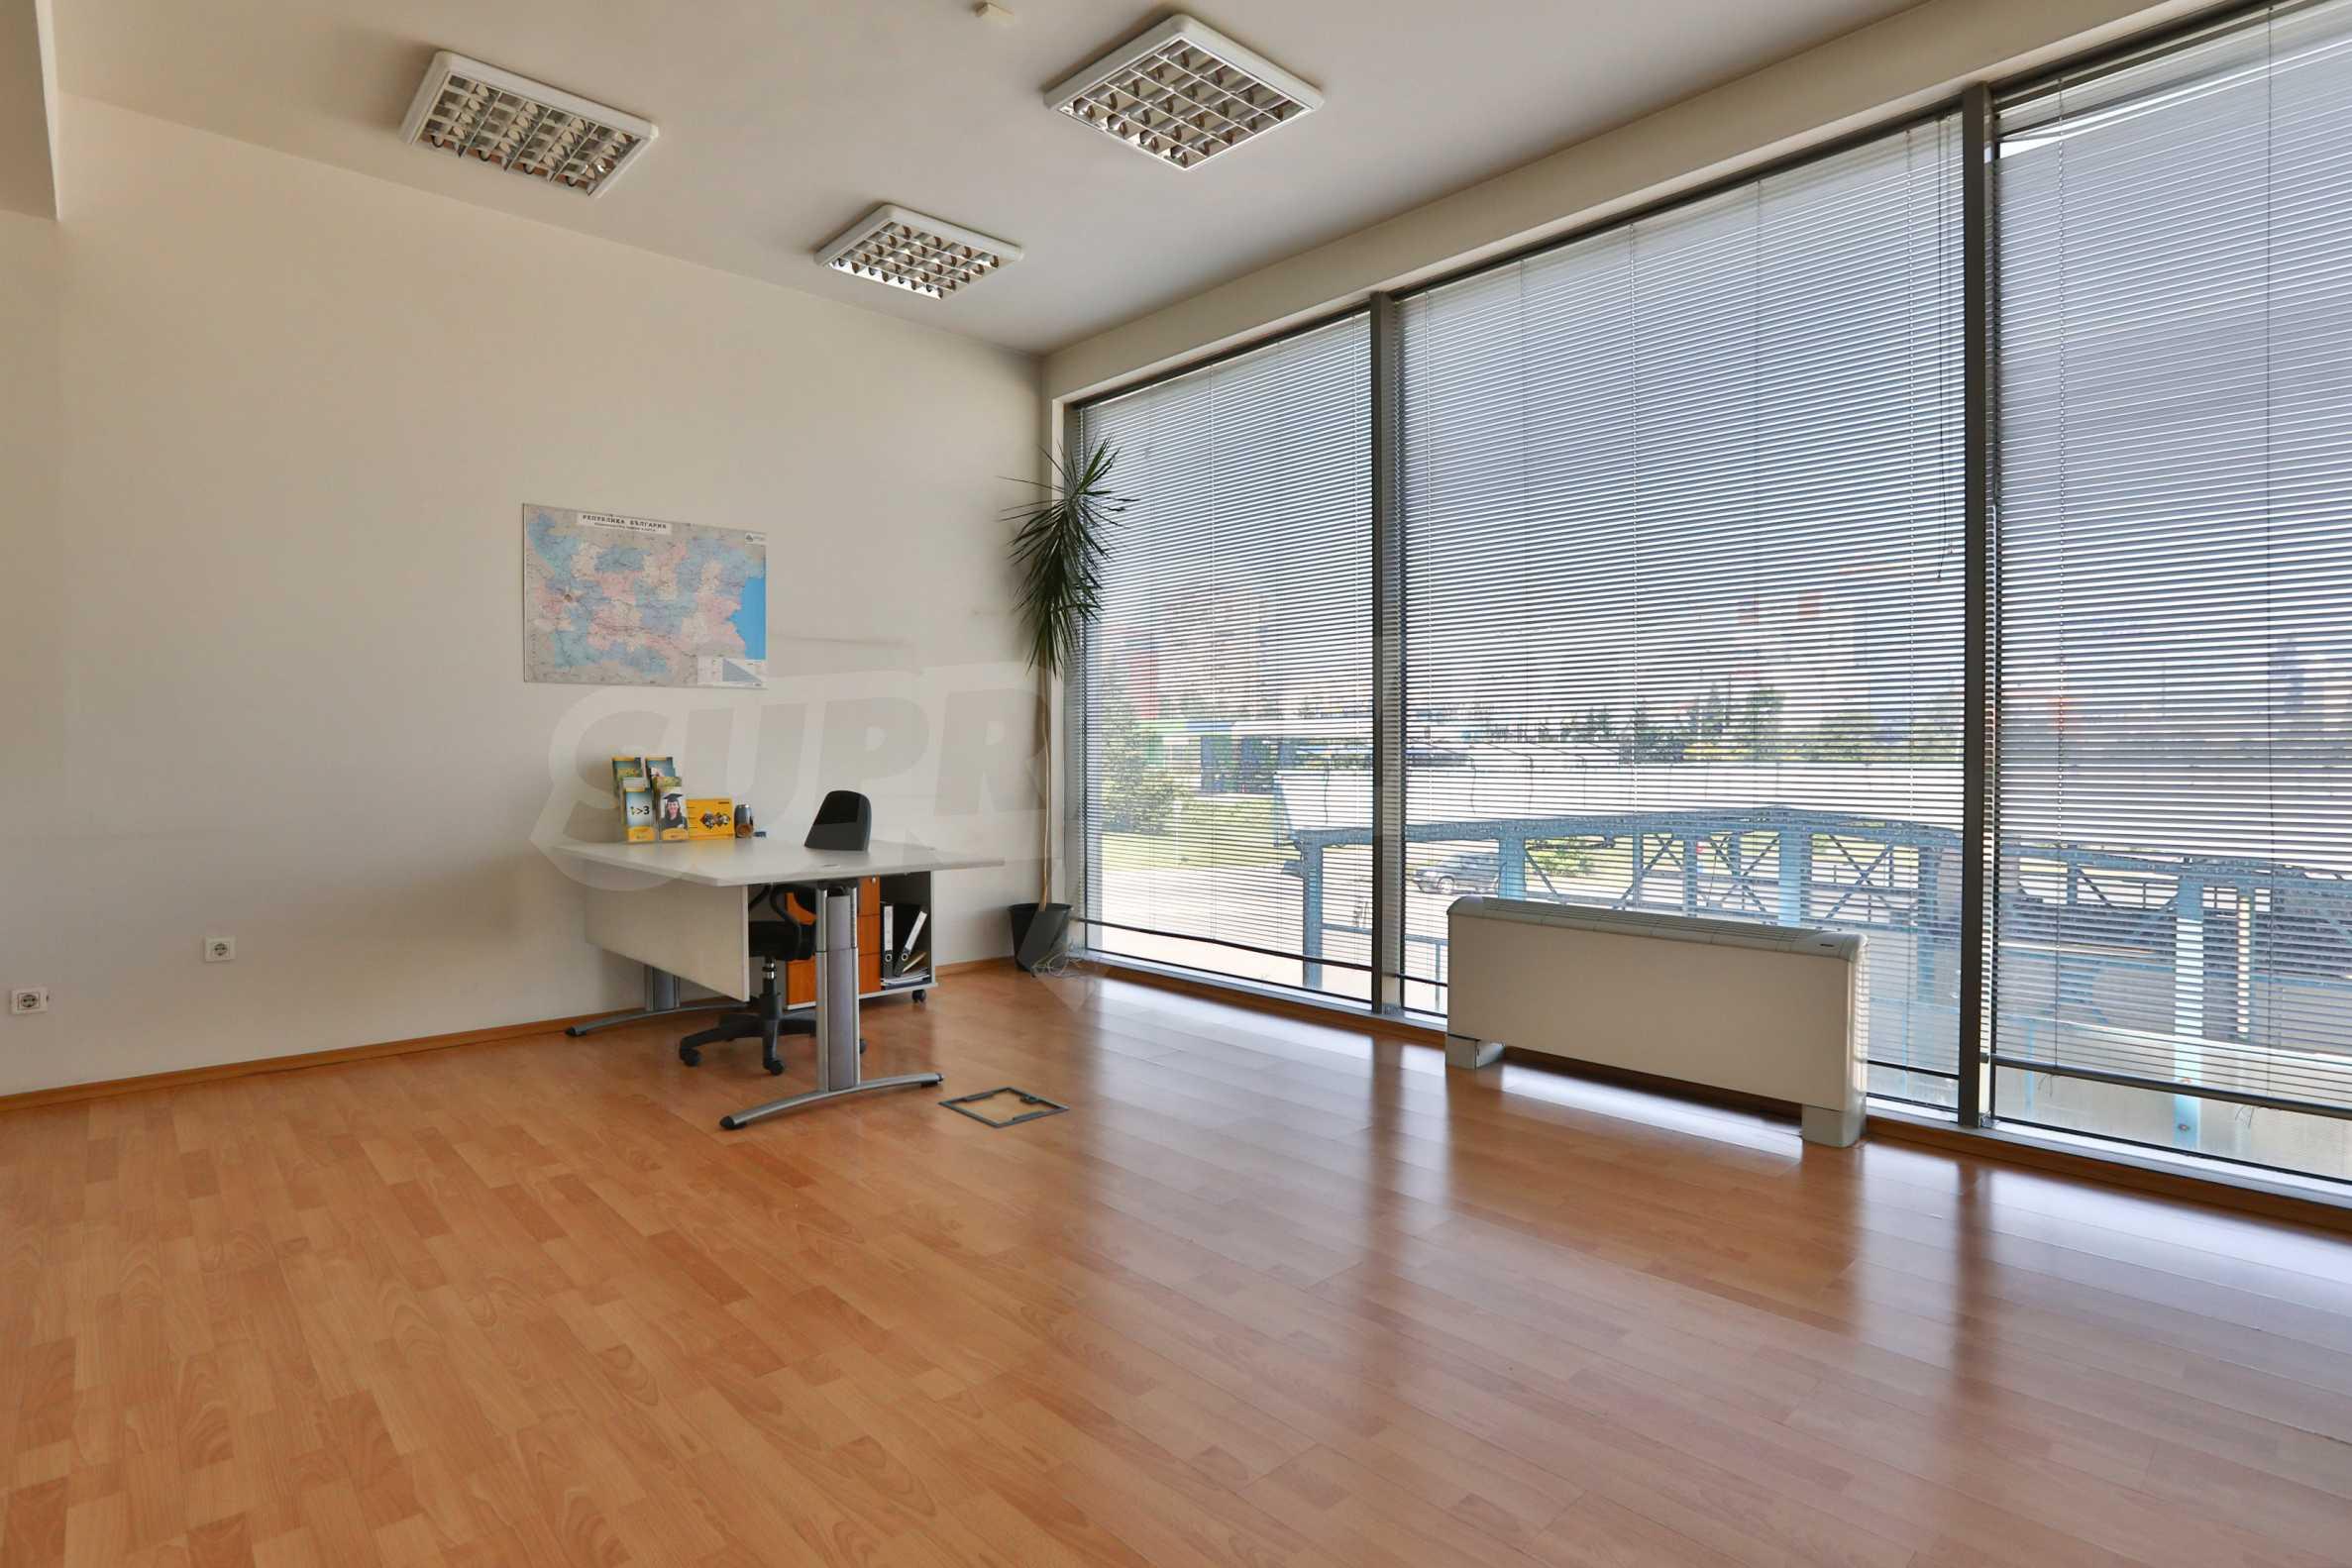 Офис в бизнес сграда висок клас на бул. Цариградско шосе 34